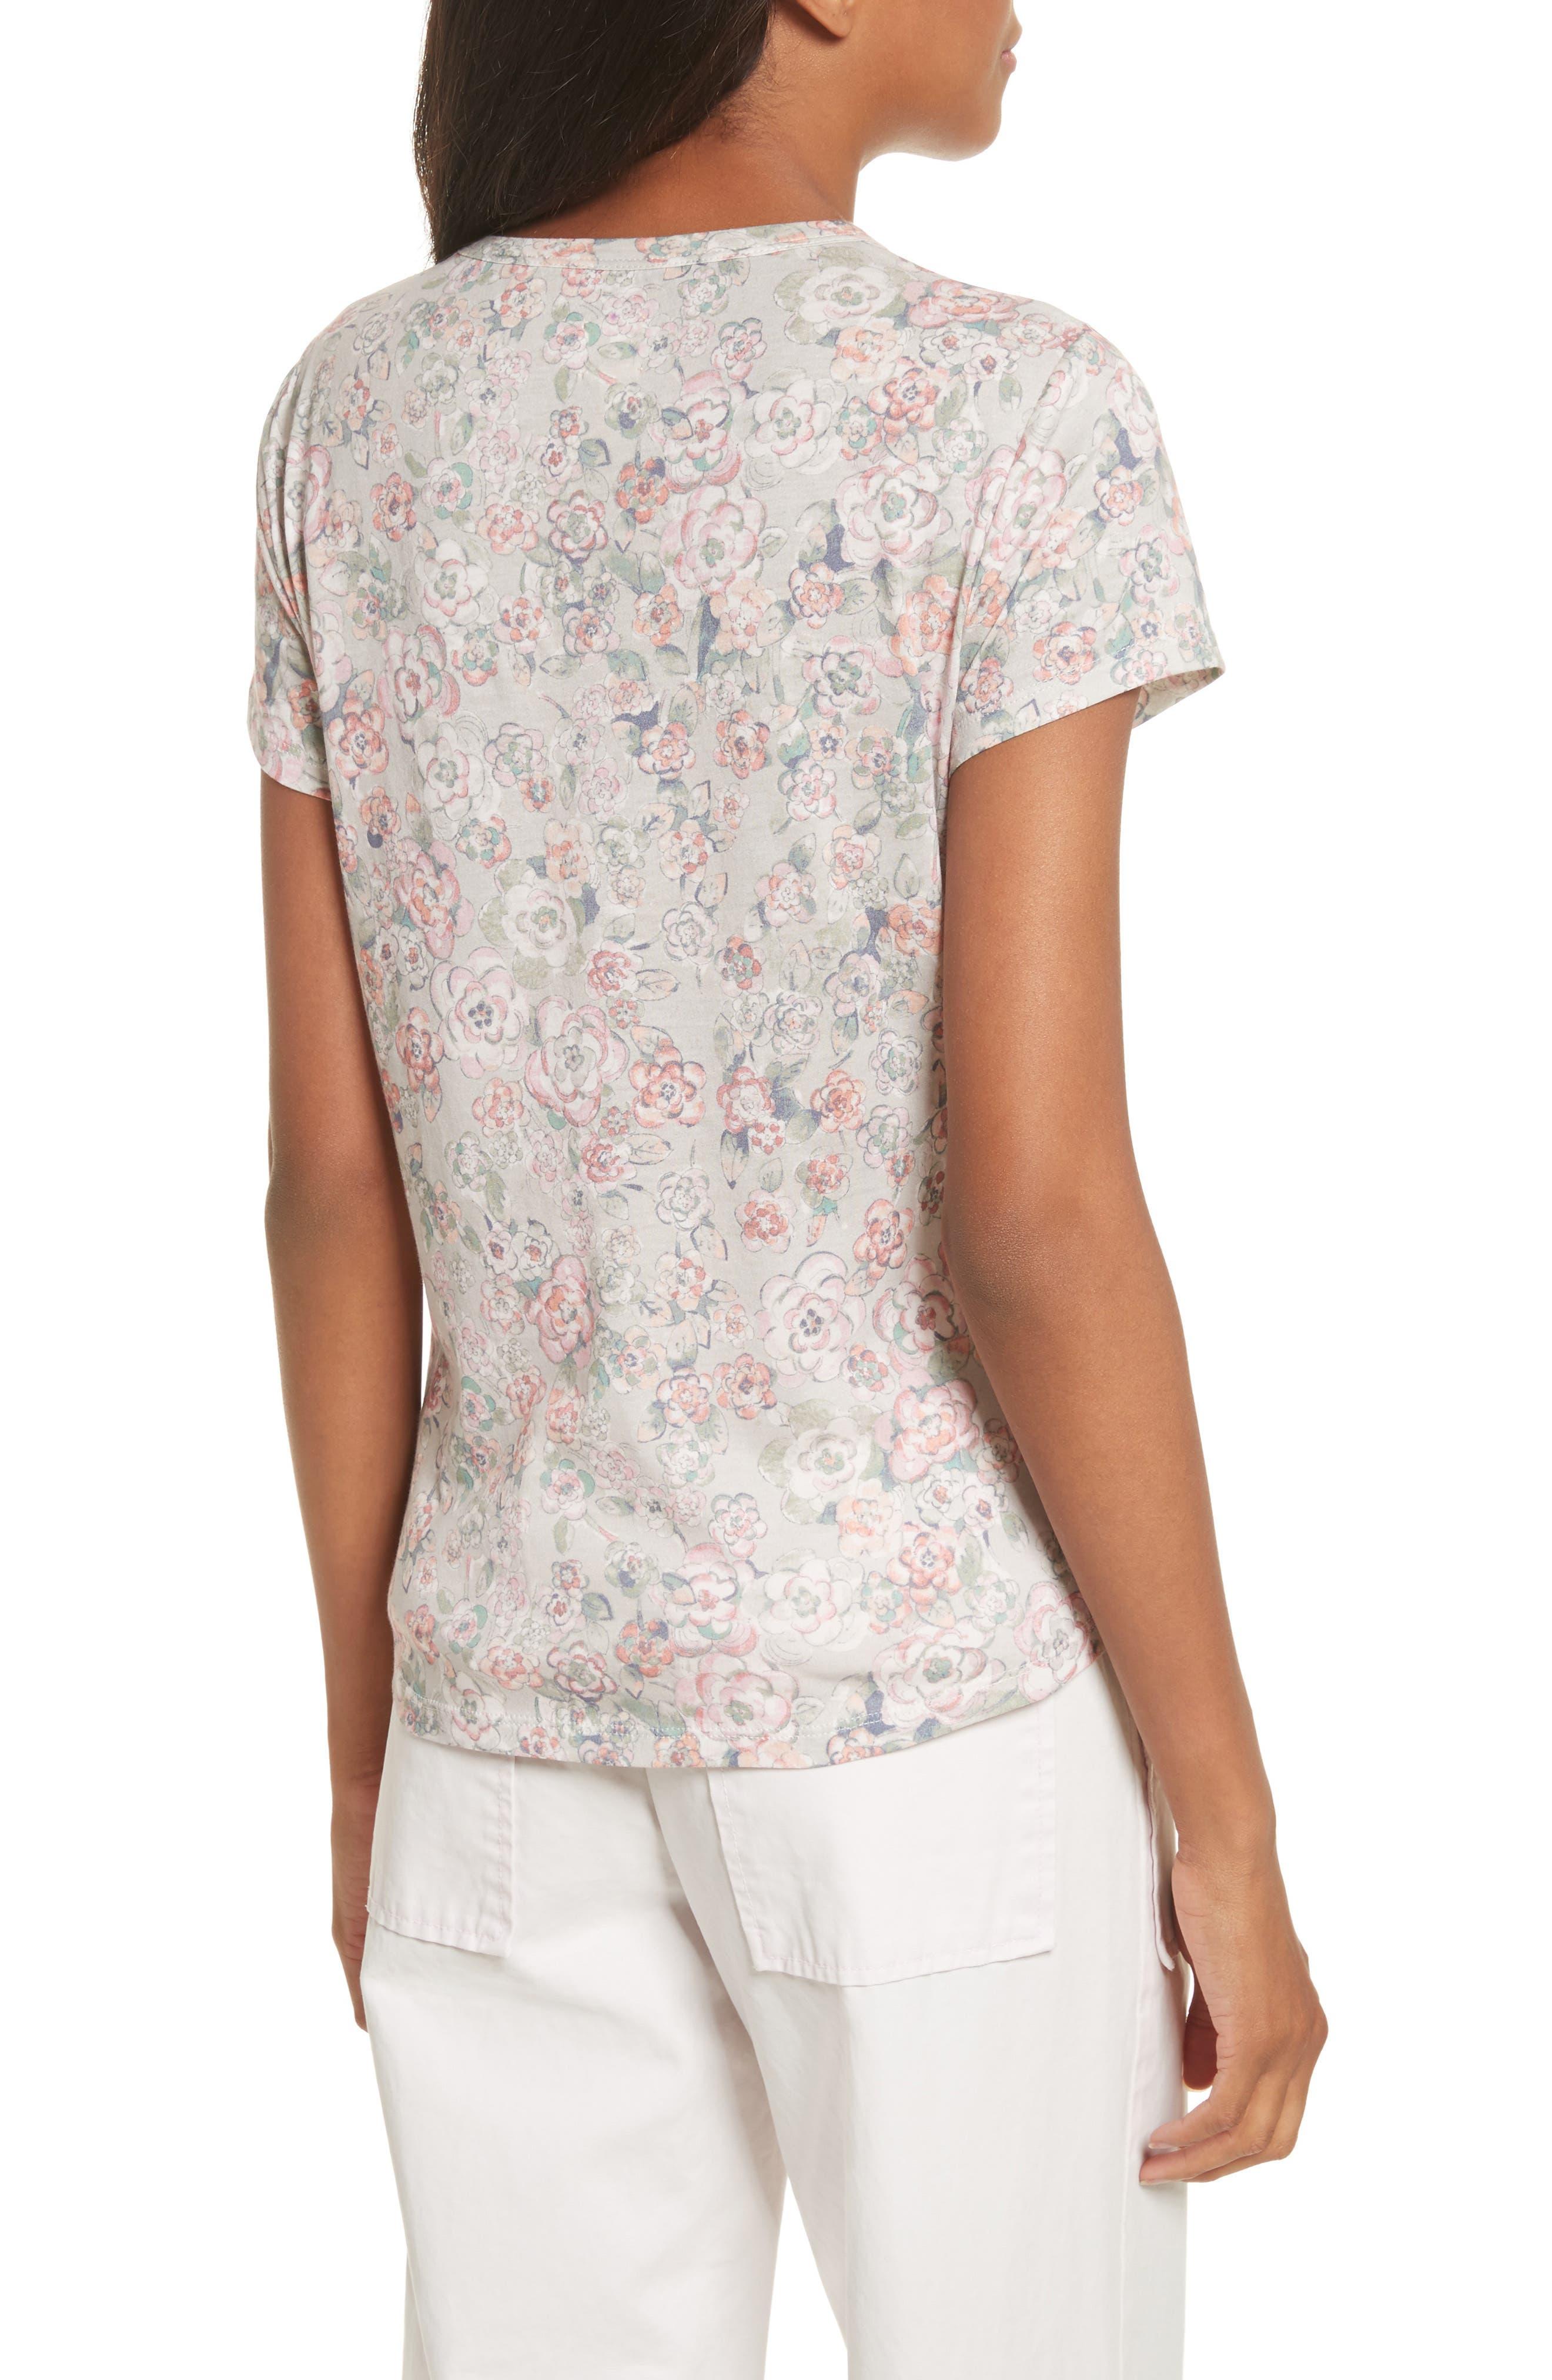 Alternate Image 2  - La Vie Rebecca Taylor Fabienne Floral Jersey Top